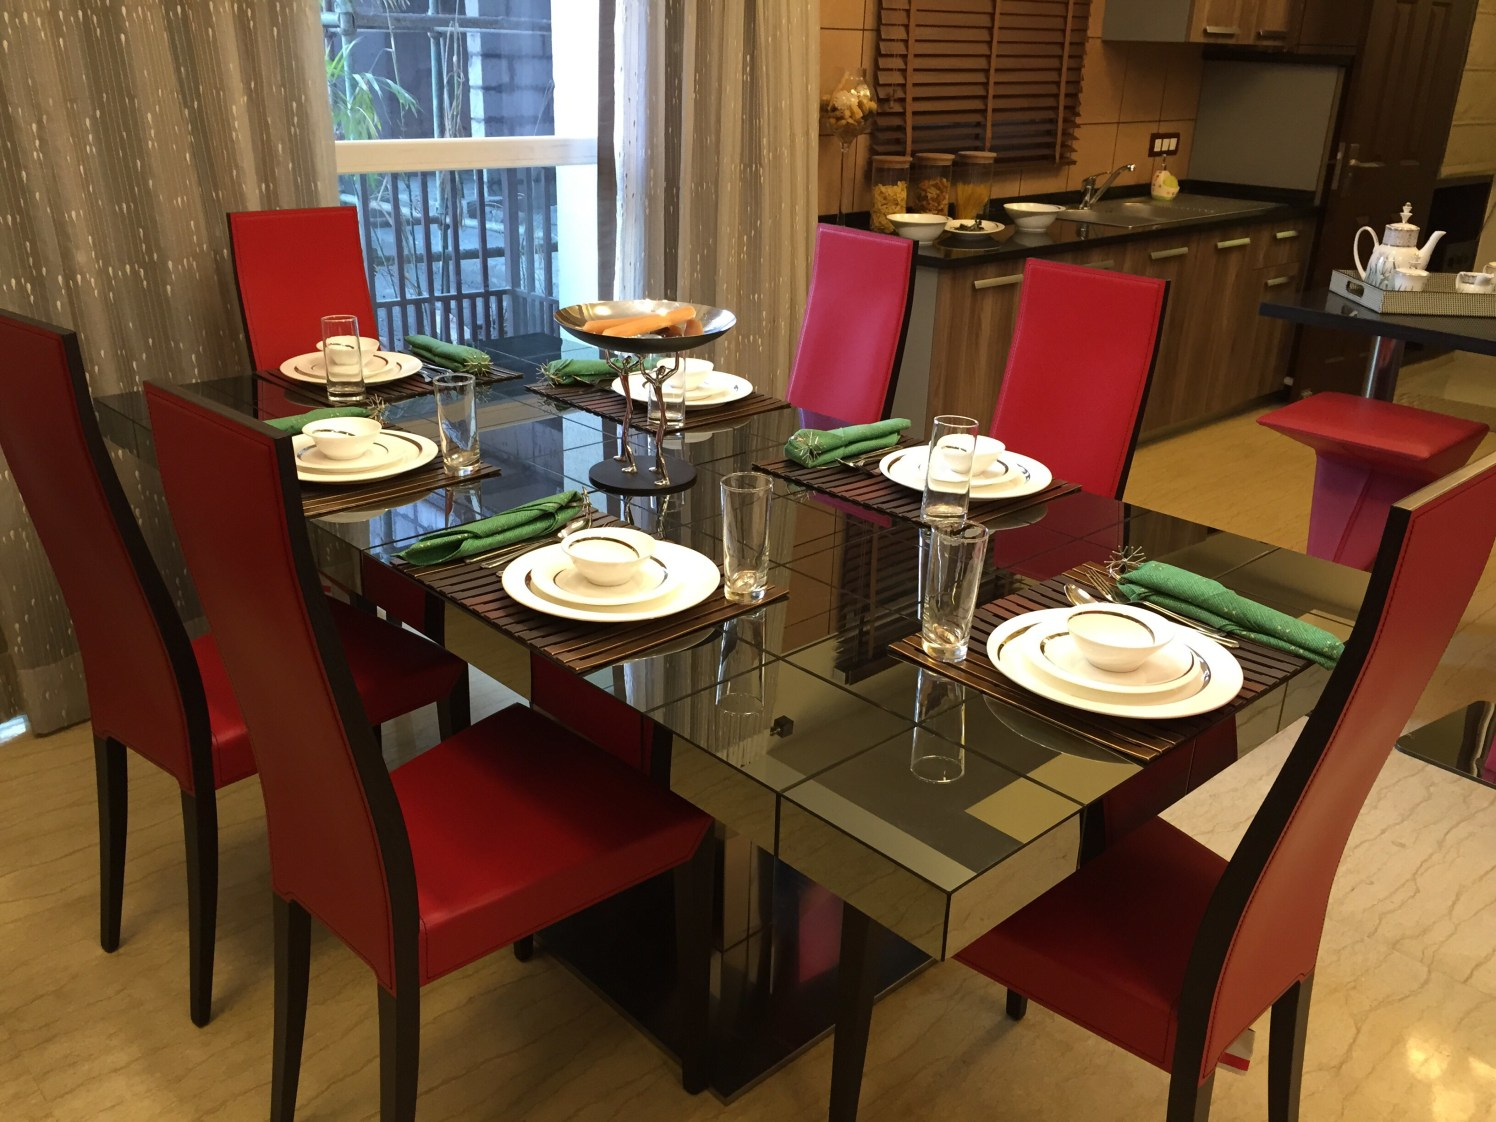 Dining Room by Deepali Garg Modern | Interior Design Photos & Ideas